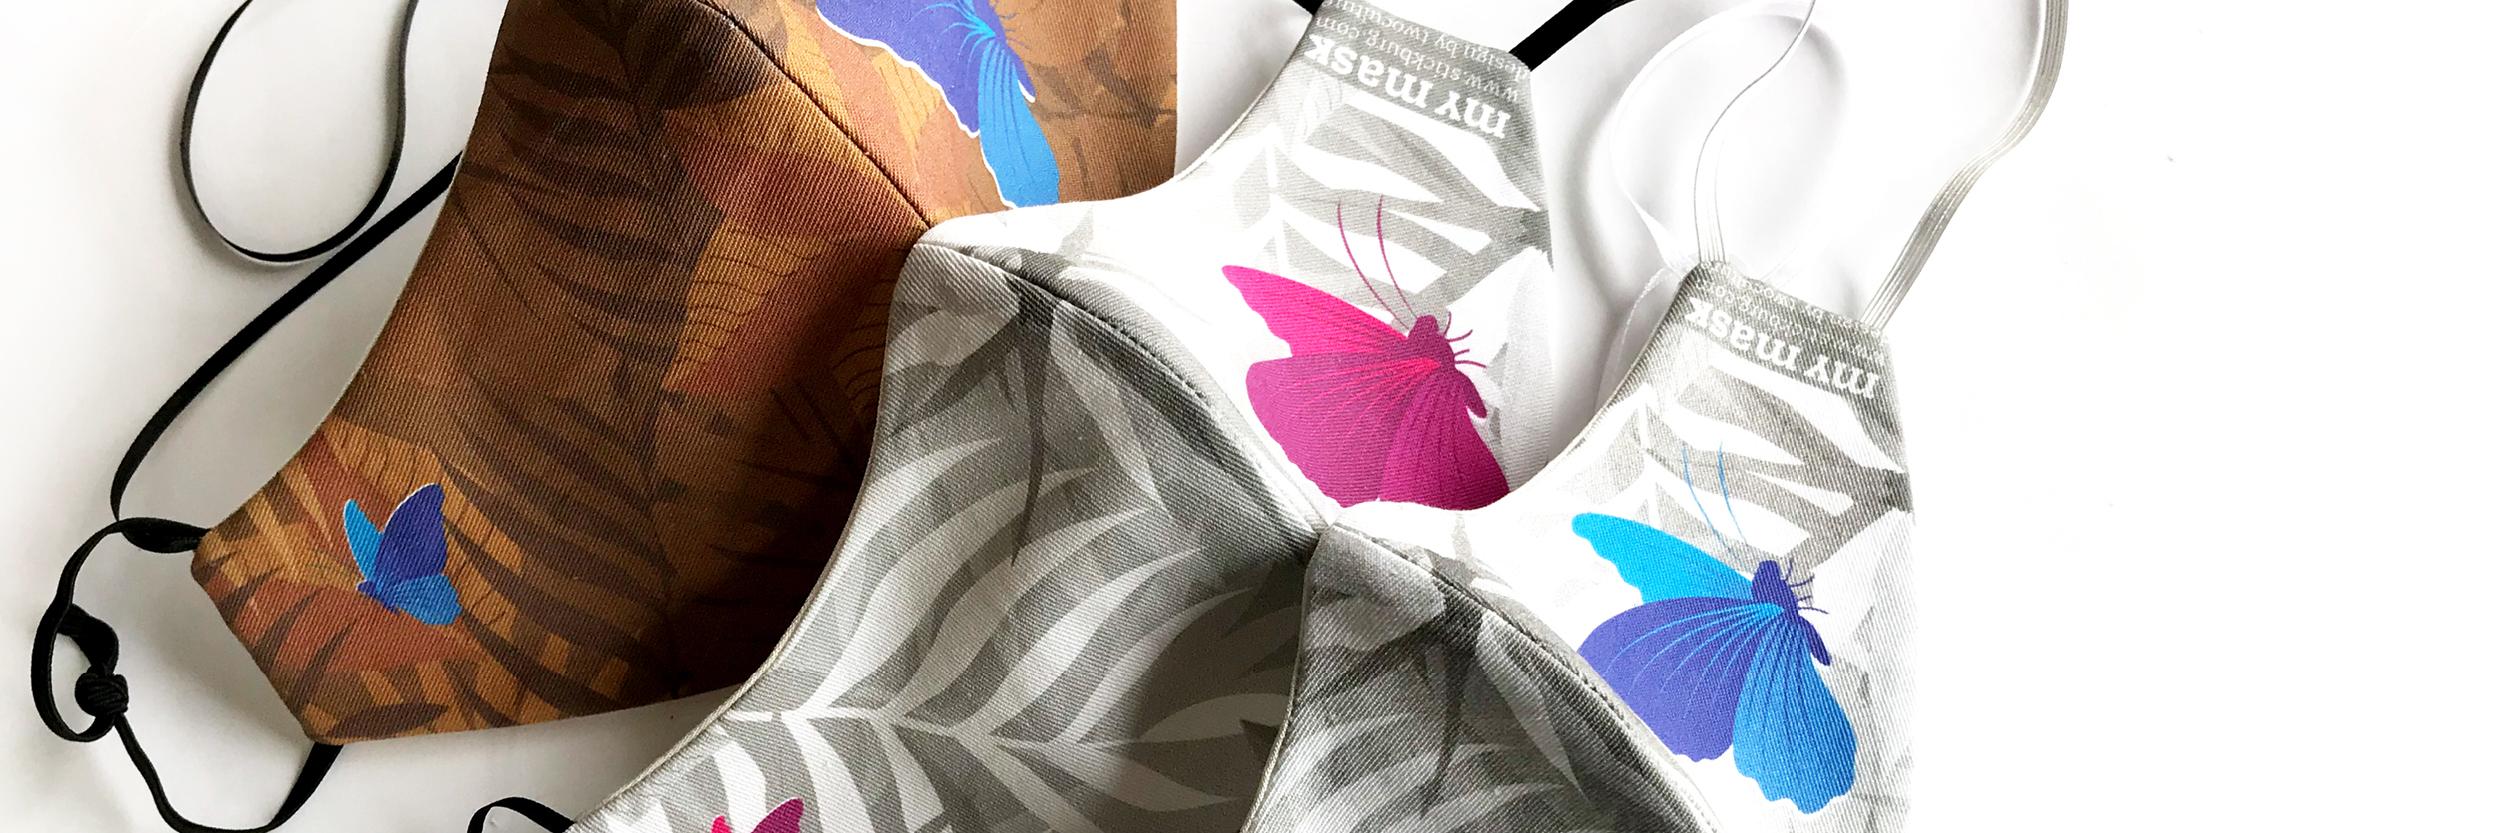 Butterfly-Mask